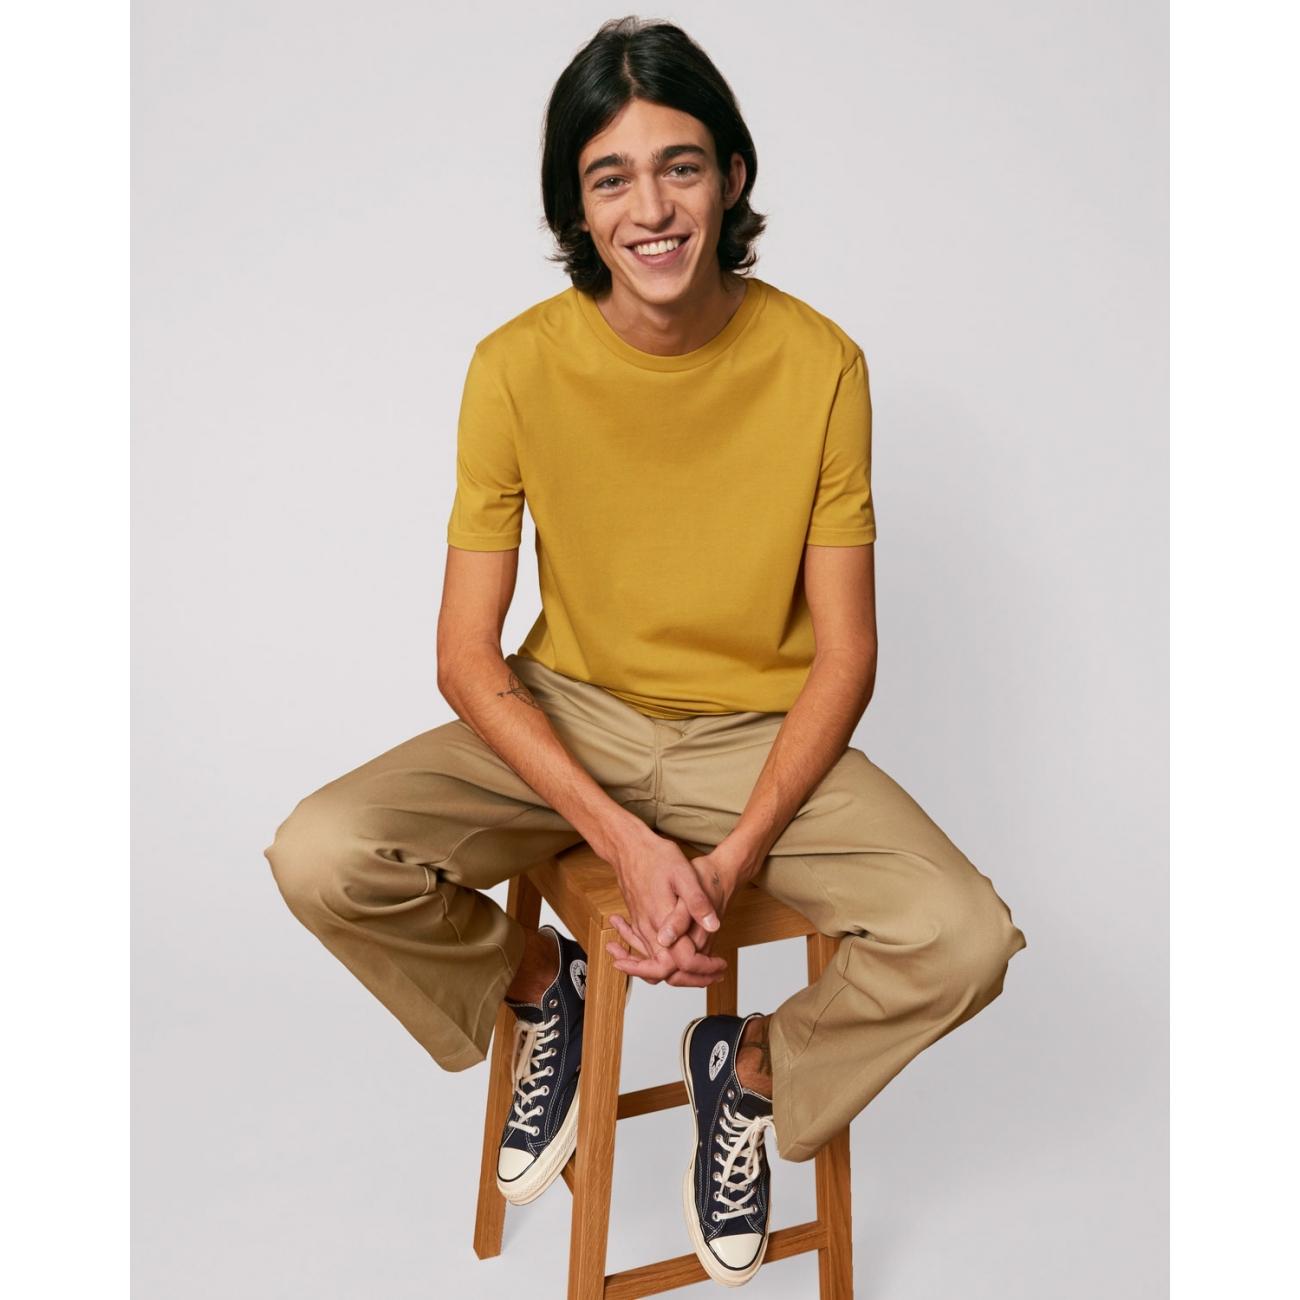 https://tee-shirt-bio.com/10269-thickbox_default/tee-shirt-homme-coton-bio-col-rond-coupe-classique-jaune-ocre.jpg